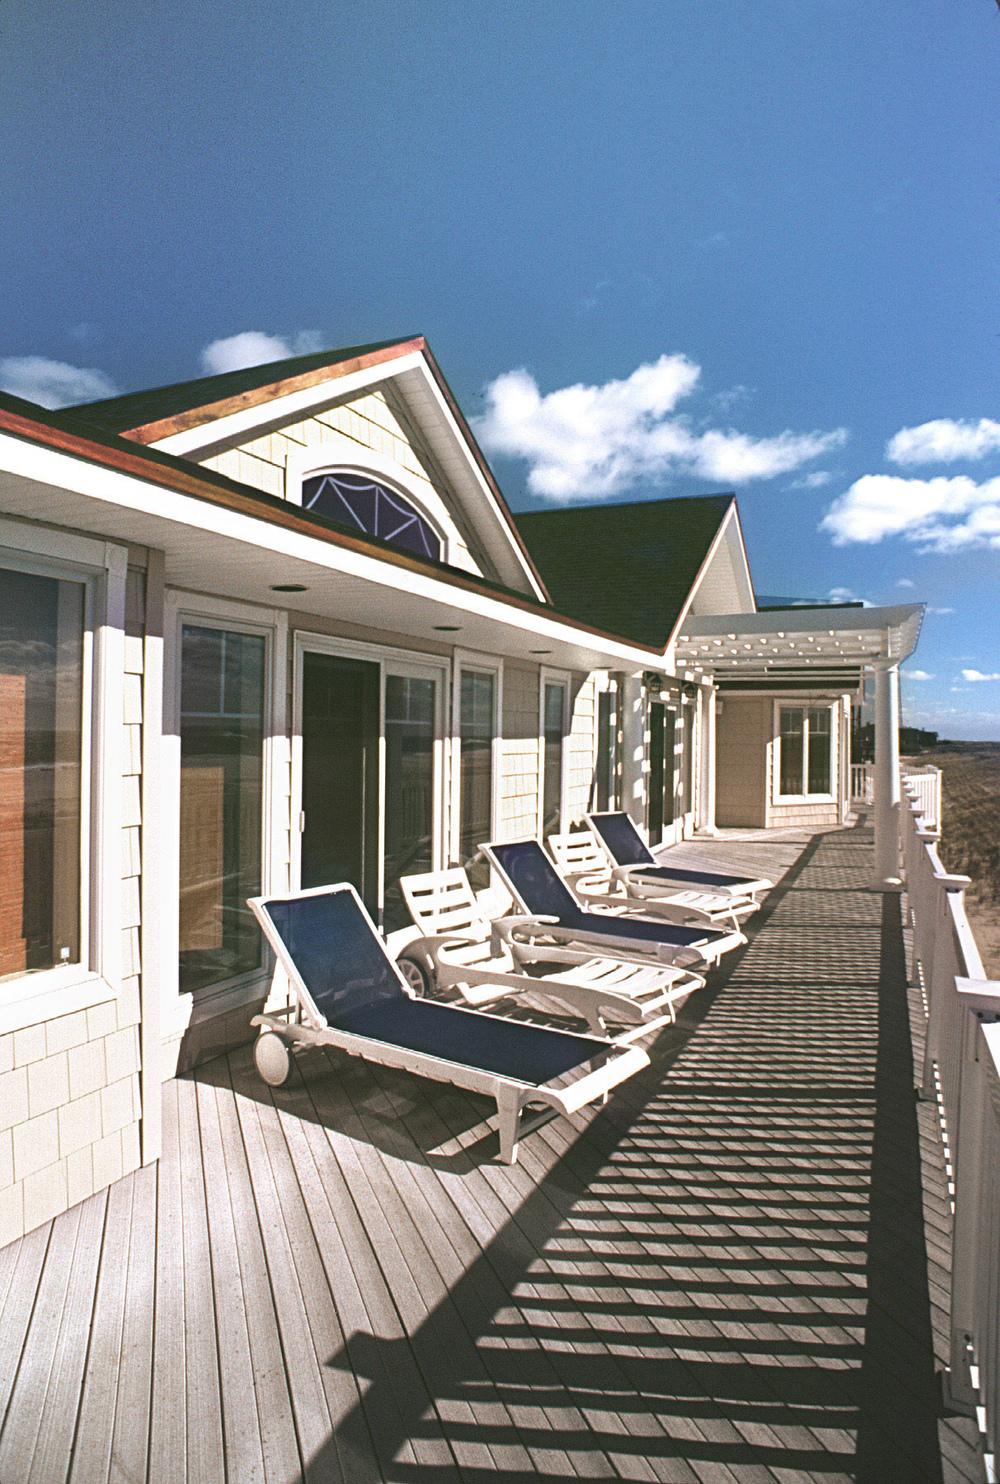 Beach House. Tobin Parnes Design. Residential. Deck View.